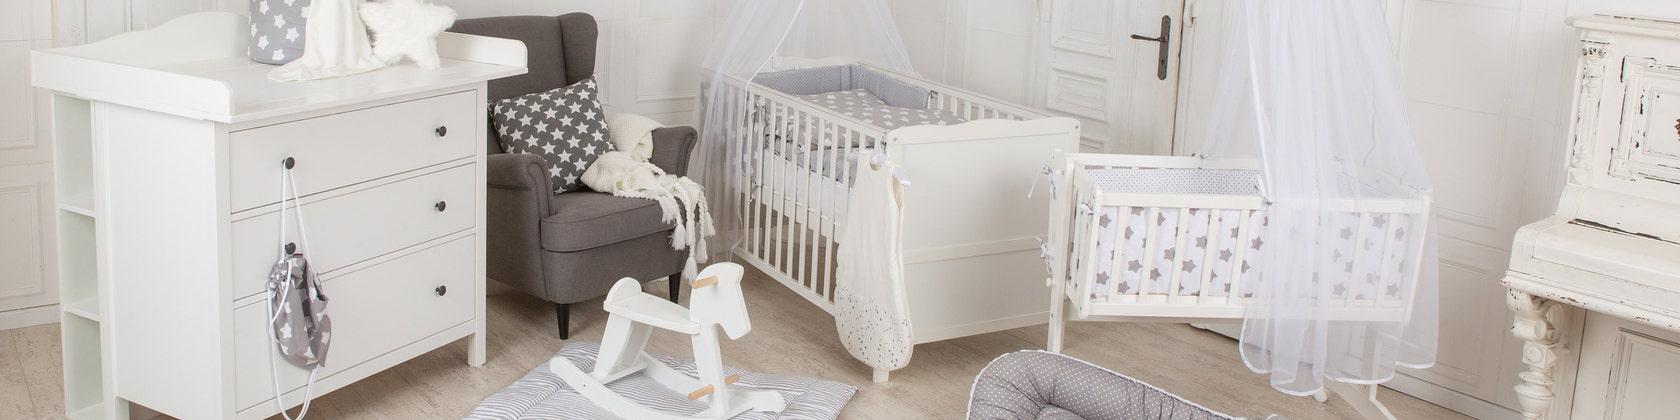 Nursery Furniture Textiles Décor By Puckdaddyshop On Etsy